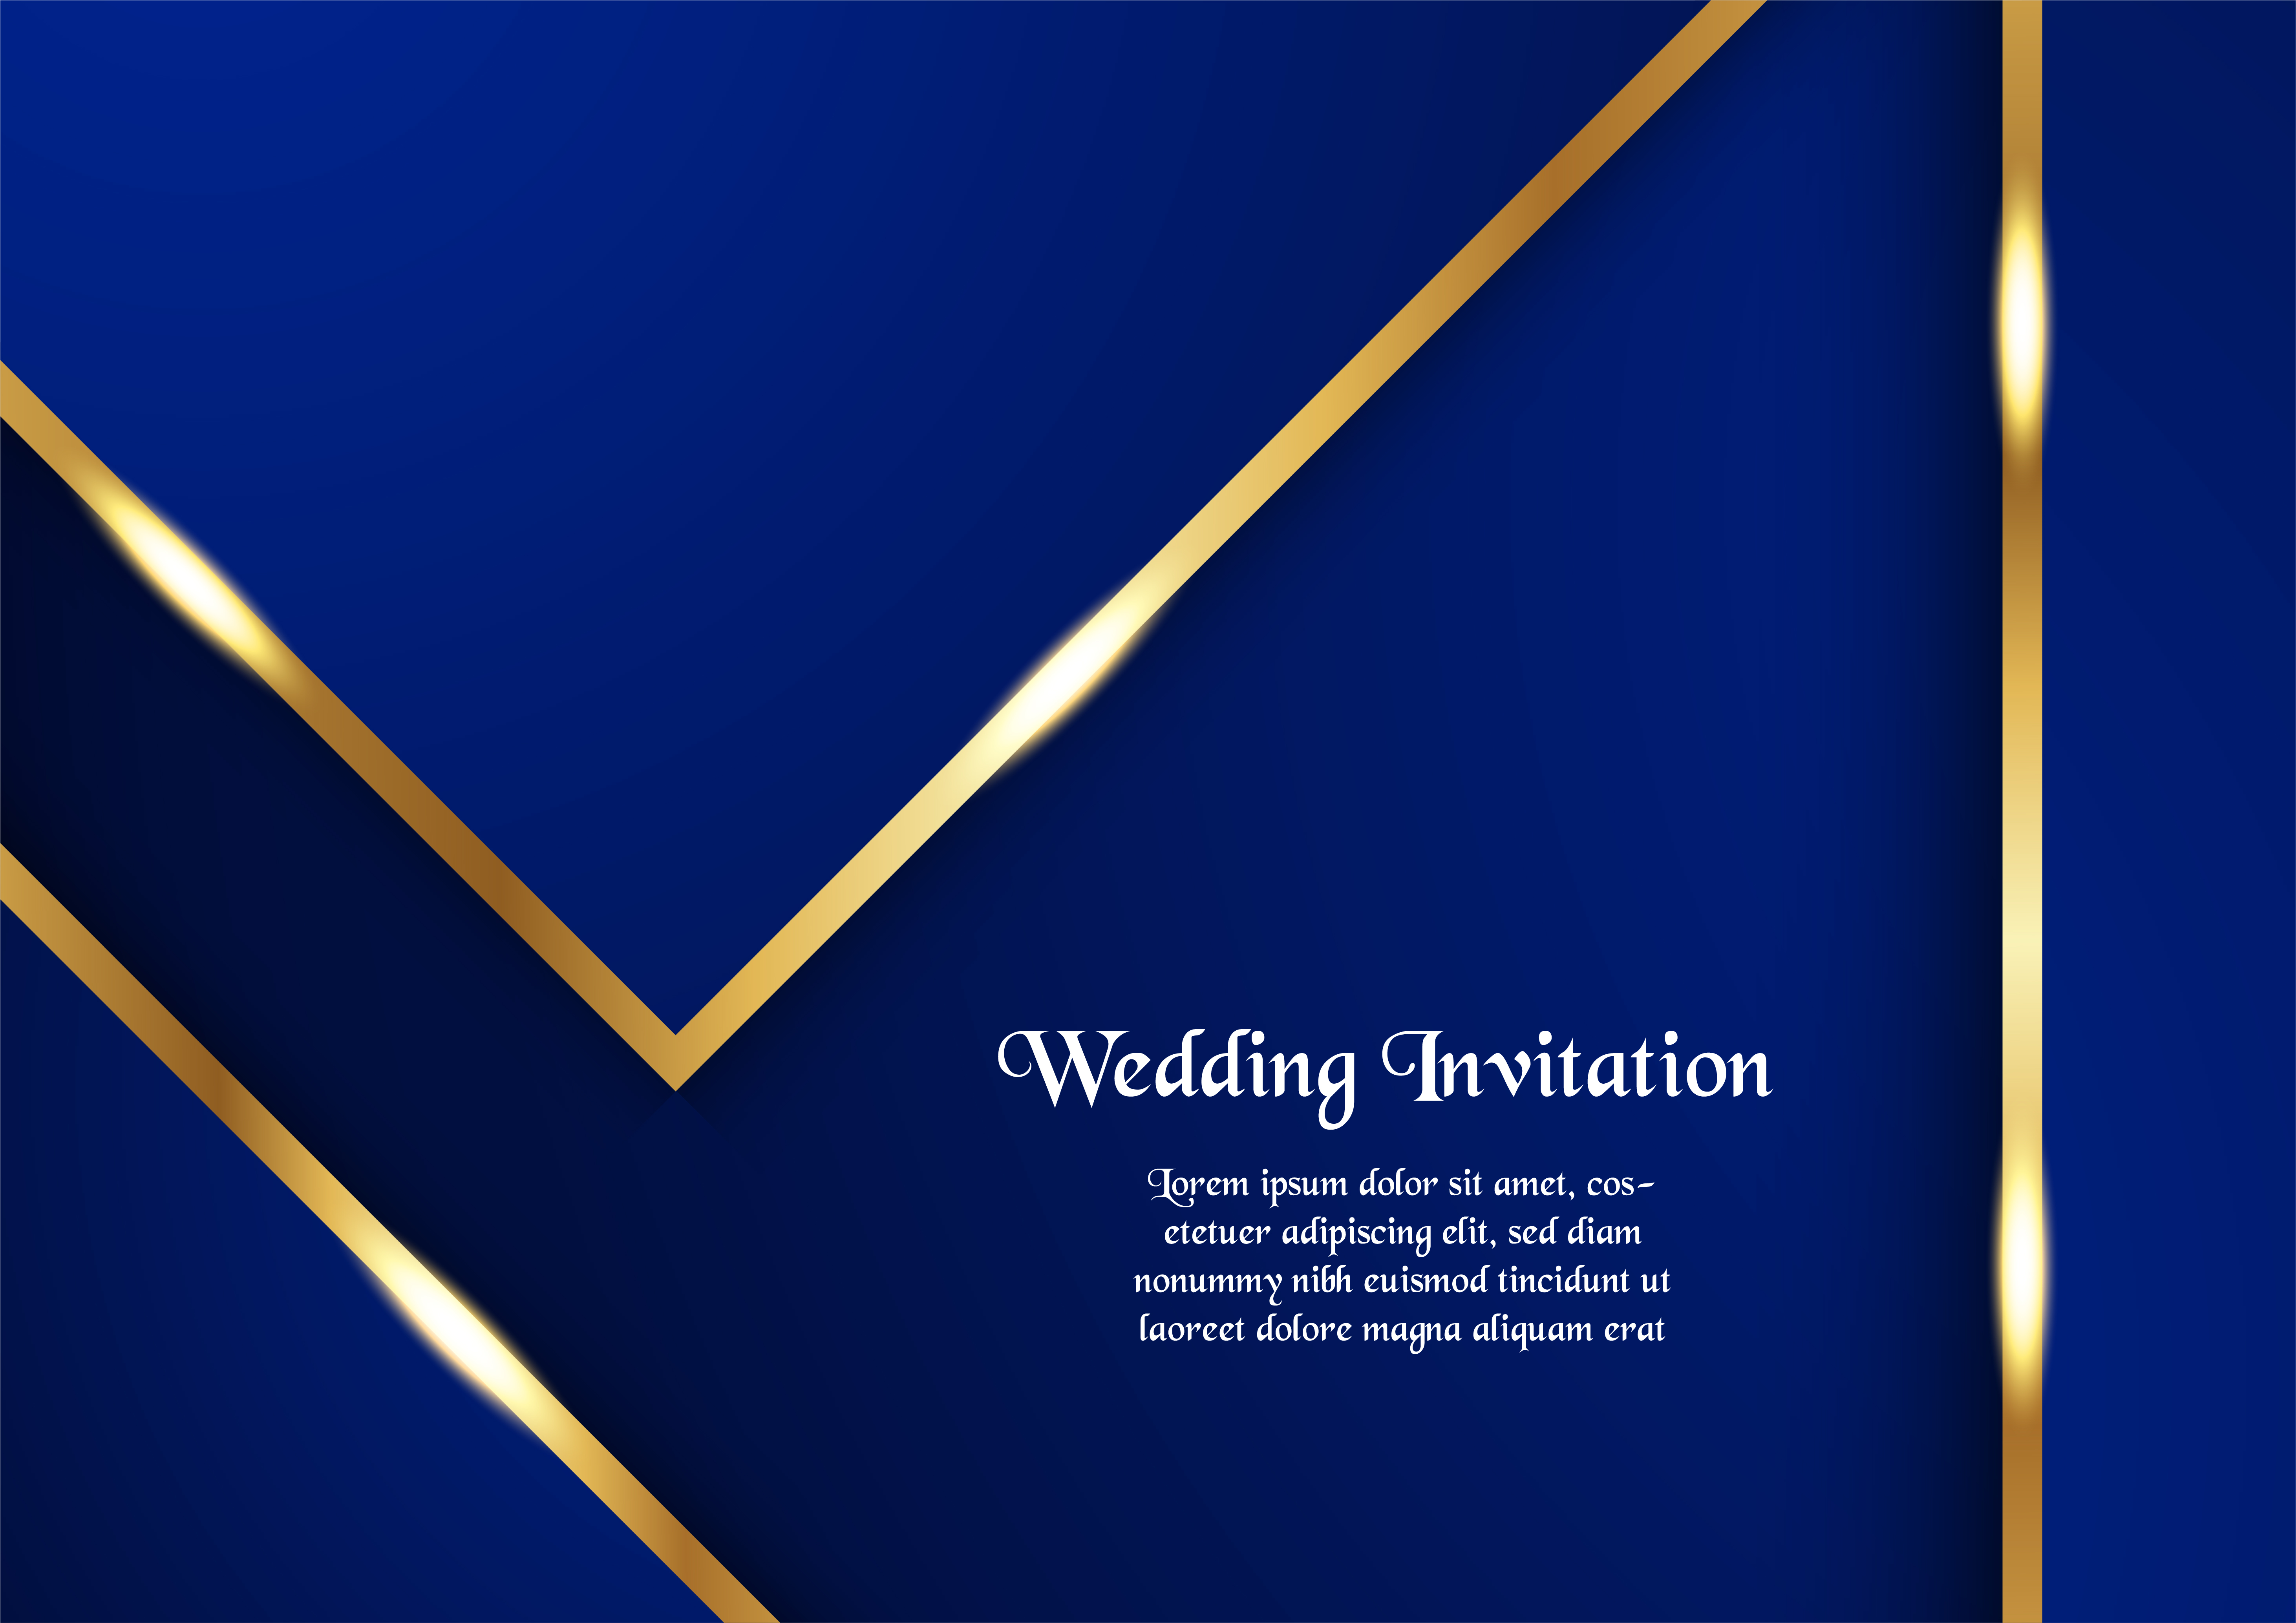 Gold Luxury Invitation Free Vector Art 3 304 Free Downloads